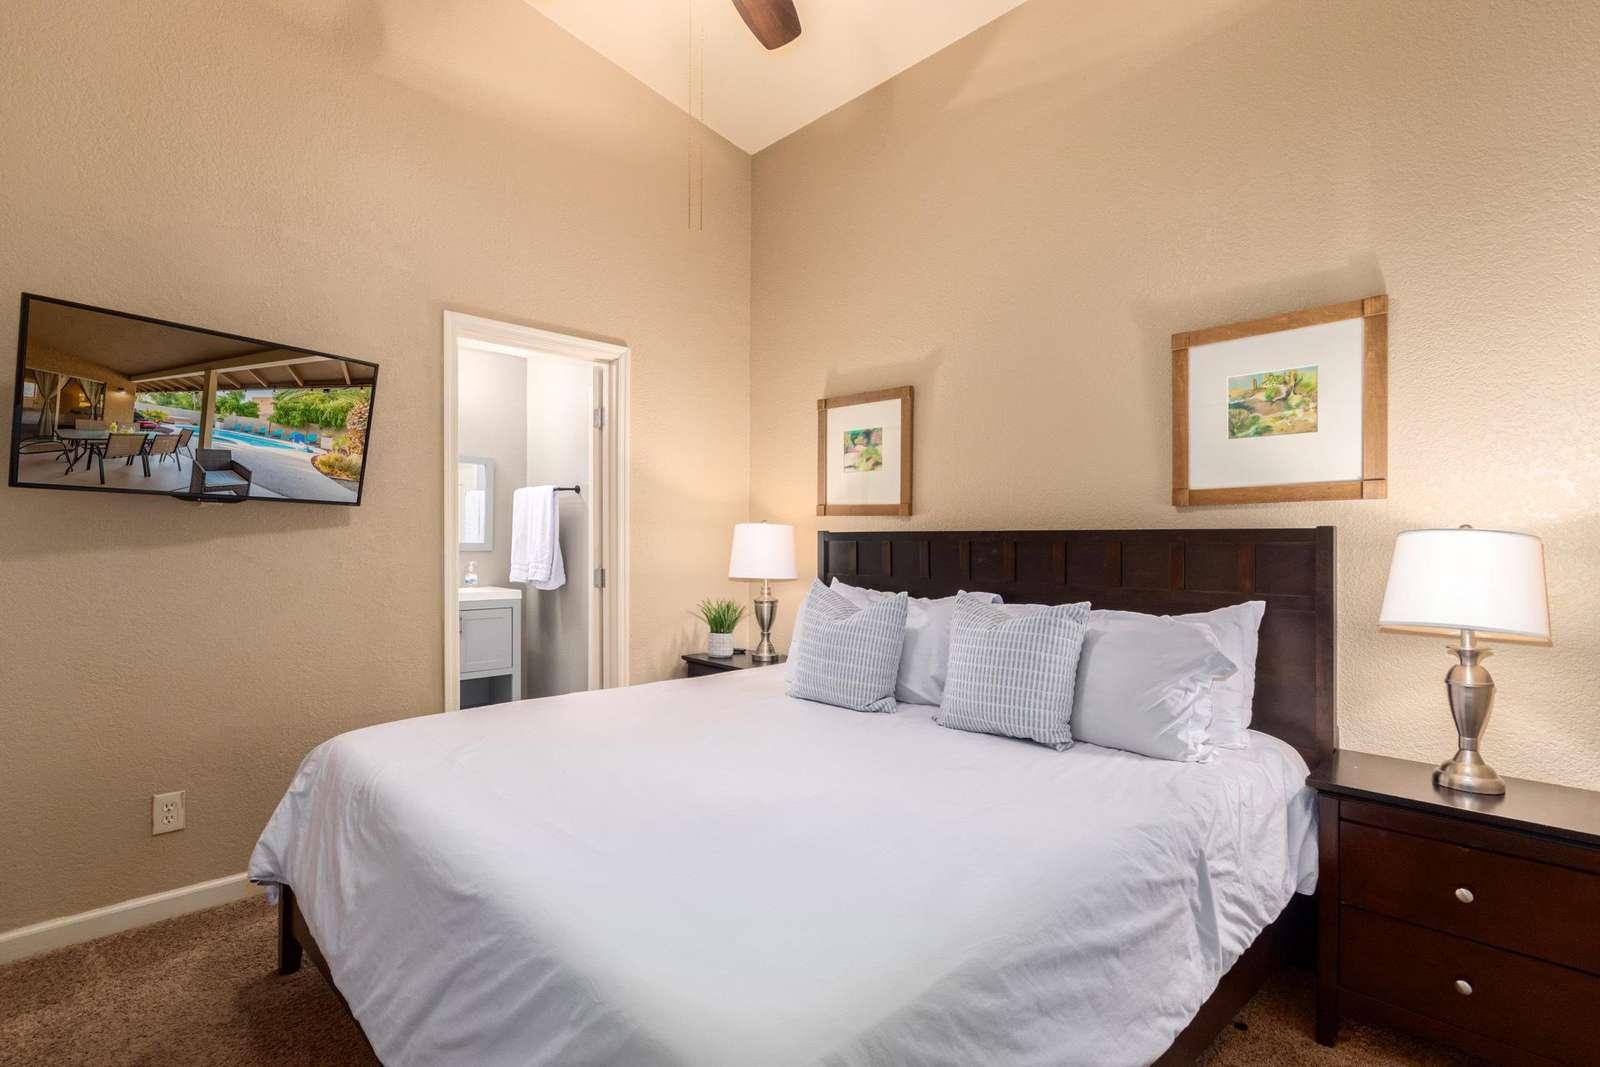 2nd Bedroom Has A King Bed/TV/Bathroom.